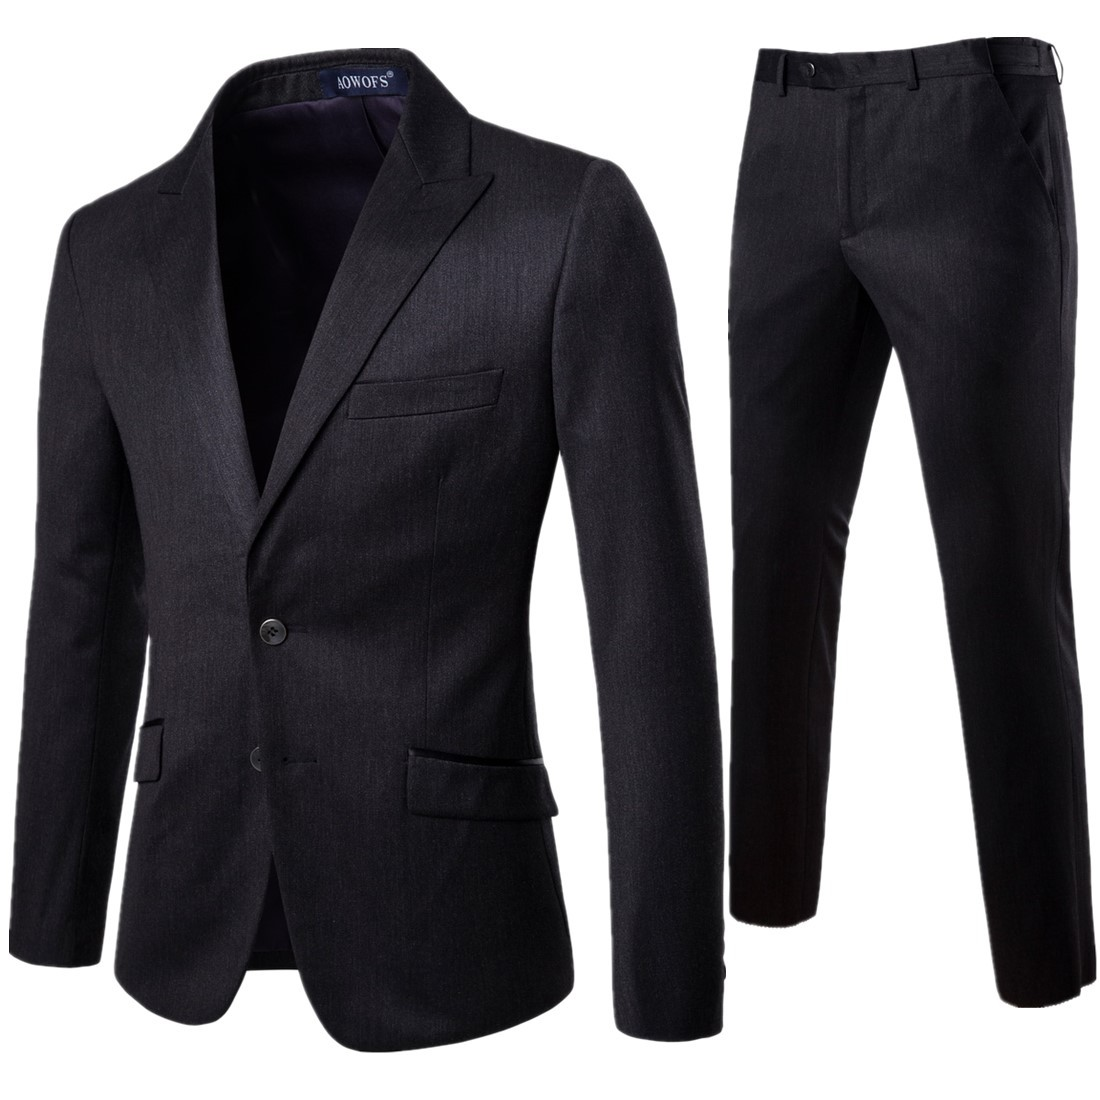 Men's Suit 2 Pieces Professional Business Suit Best Man And Groom's Wedding Dress Mens Blazer